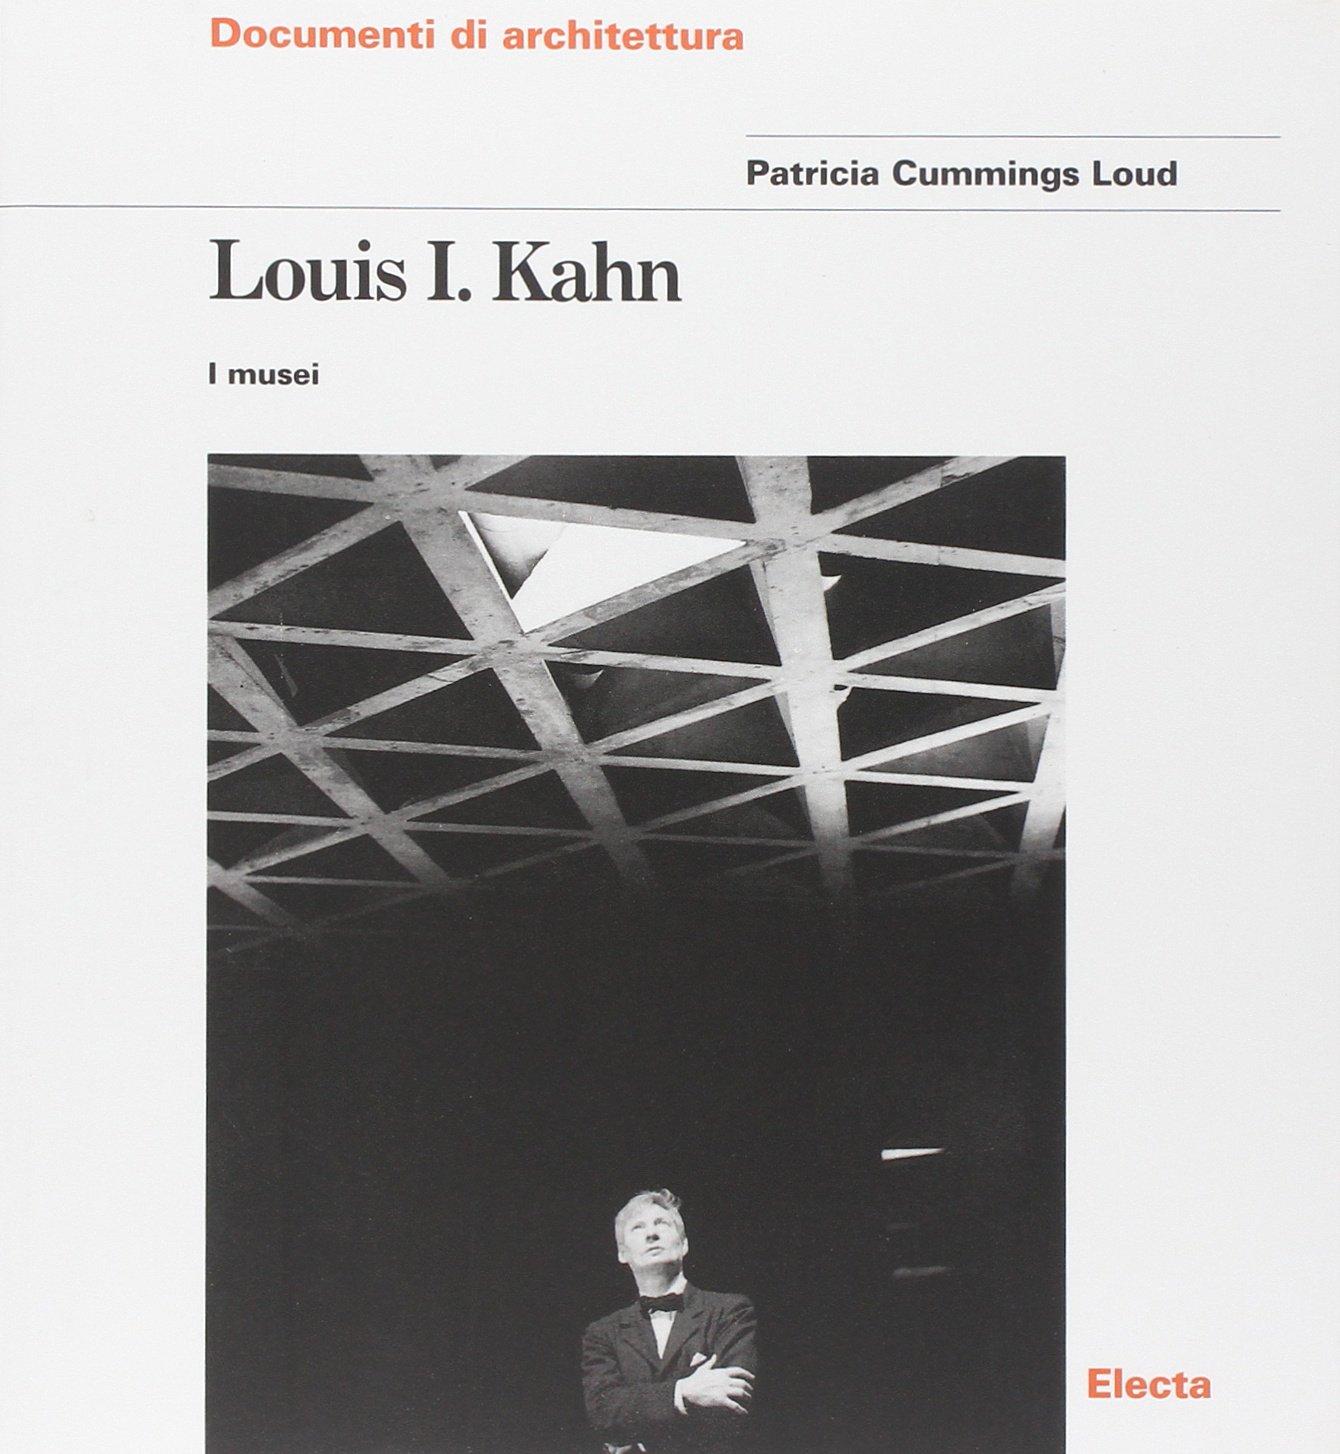 Louis I. Kahn. I musei. Ediz. illustrata Copertina flessibile – 1 gen 1997 Patricia Cummings Loud Mondadori Electa 8843535722 ARCHITETTURA